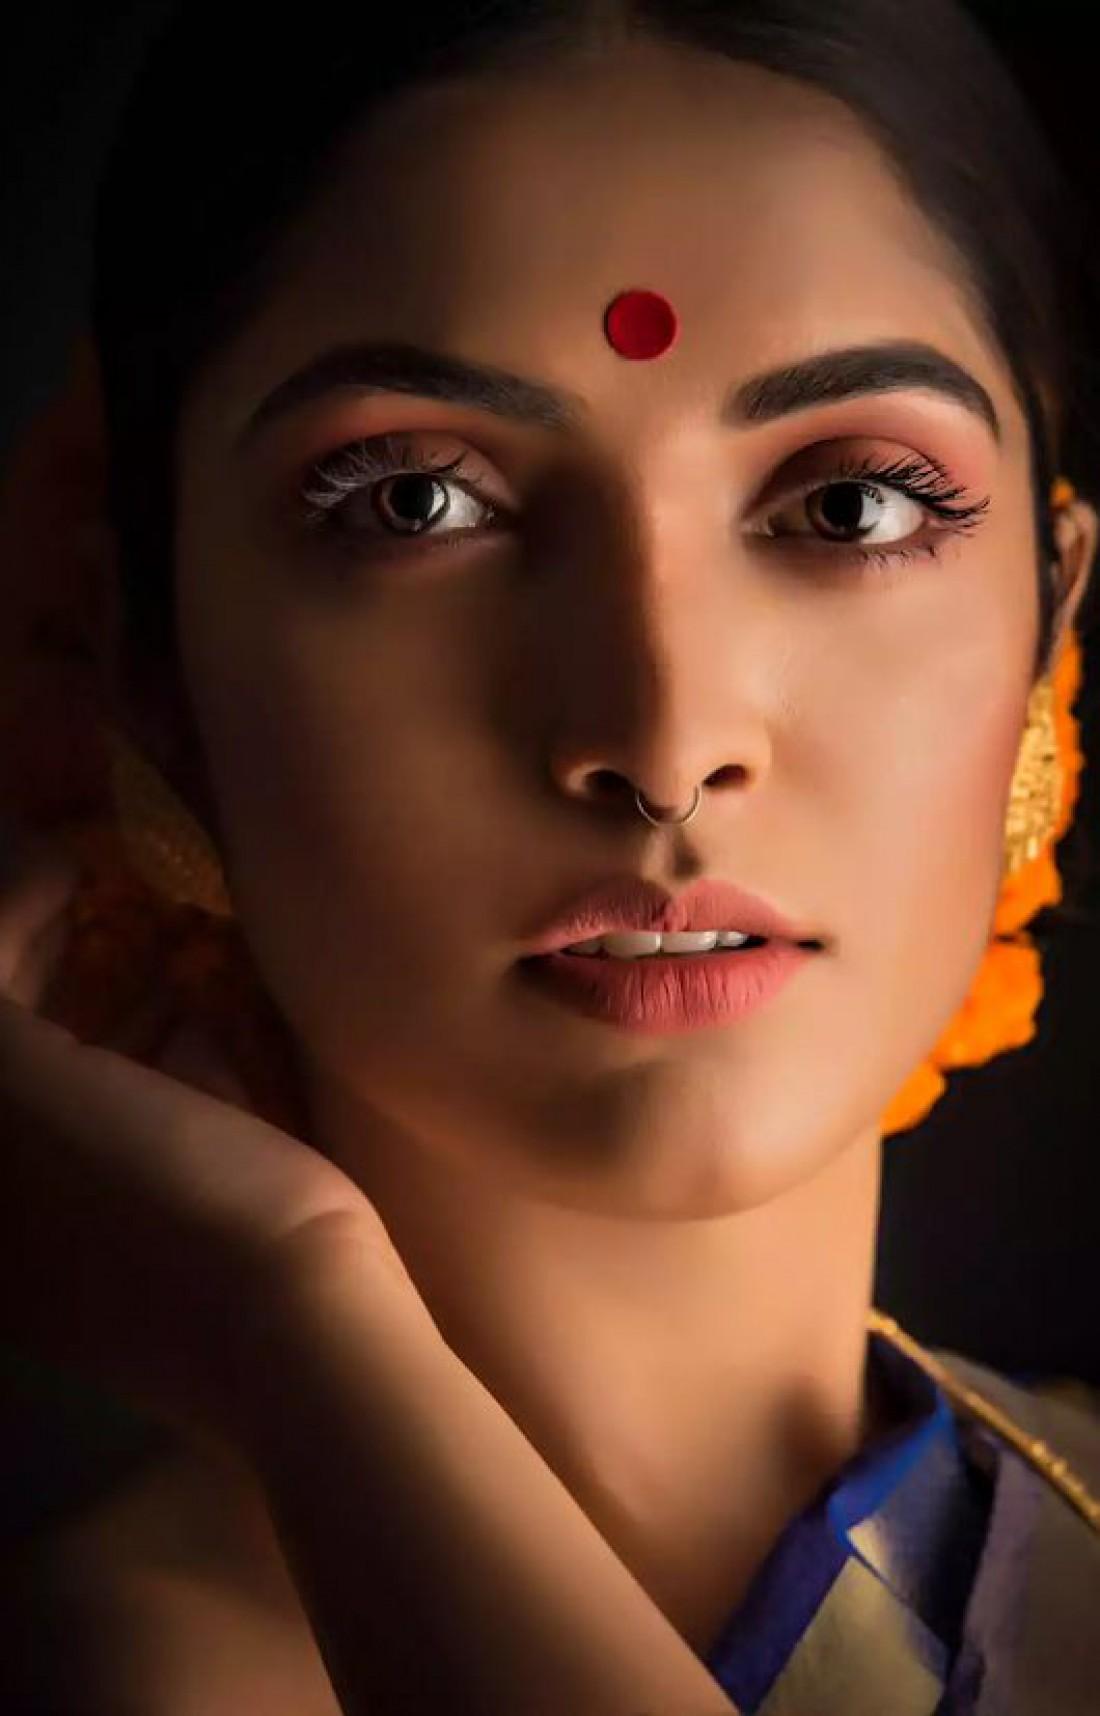 Несексуальная Камасутра: 7 правил для женщин